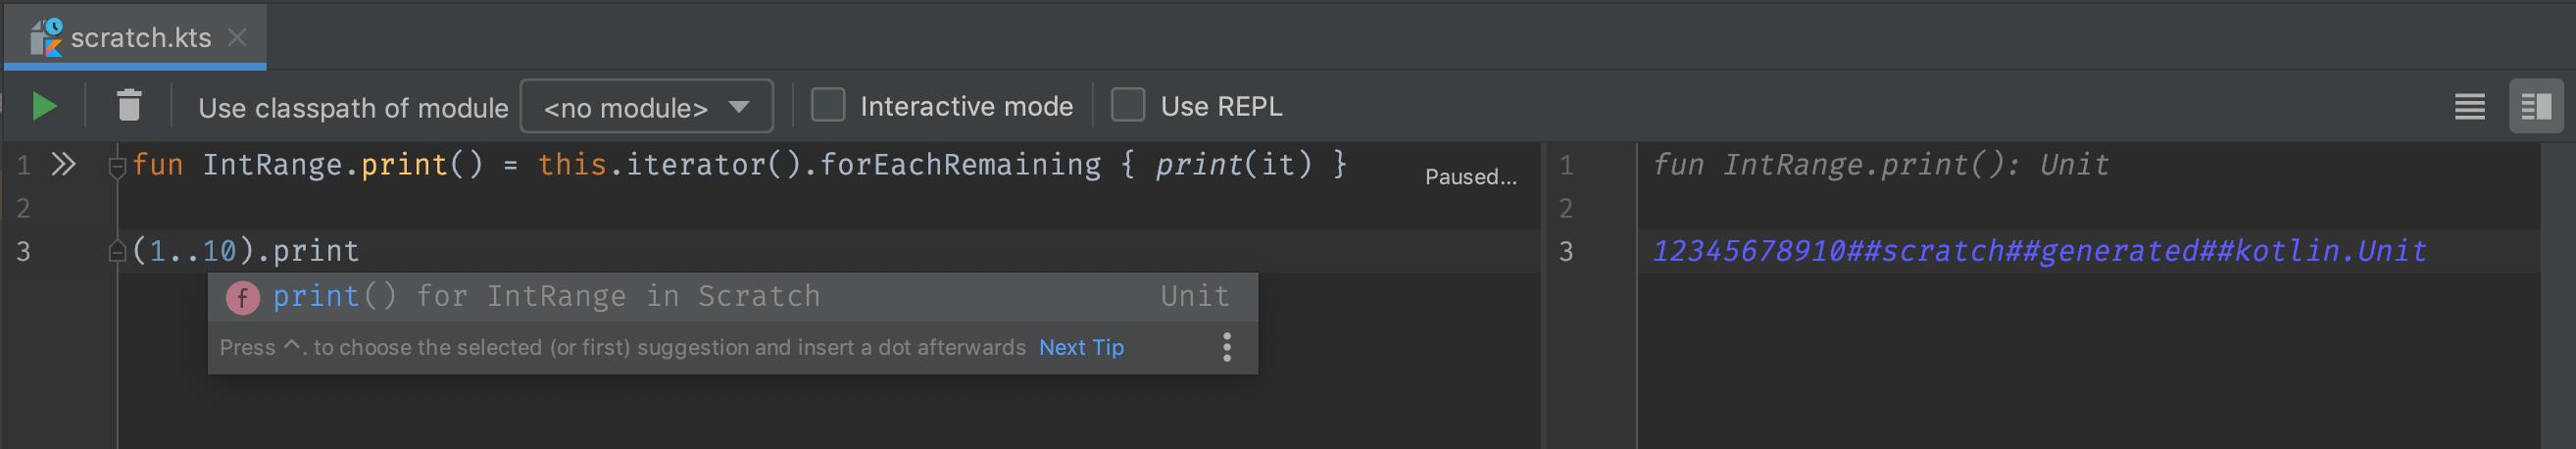 A Kotlin scratch file opened in the IntelliJ IDEA Community Edition